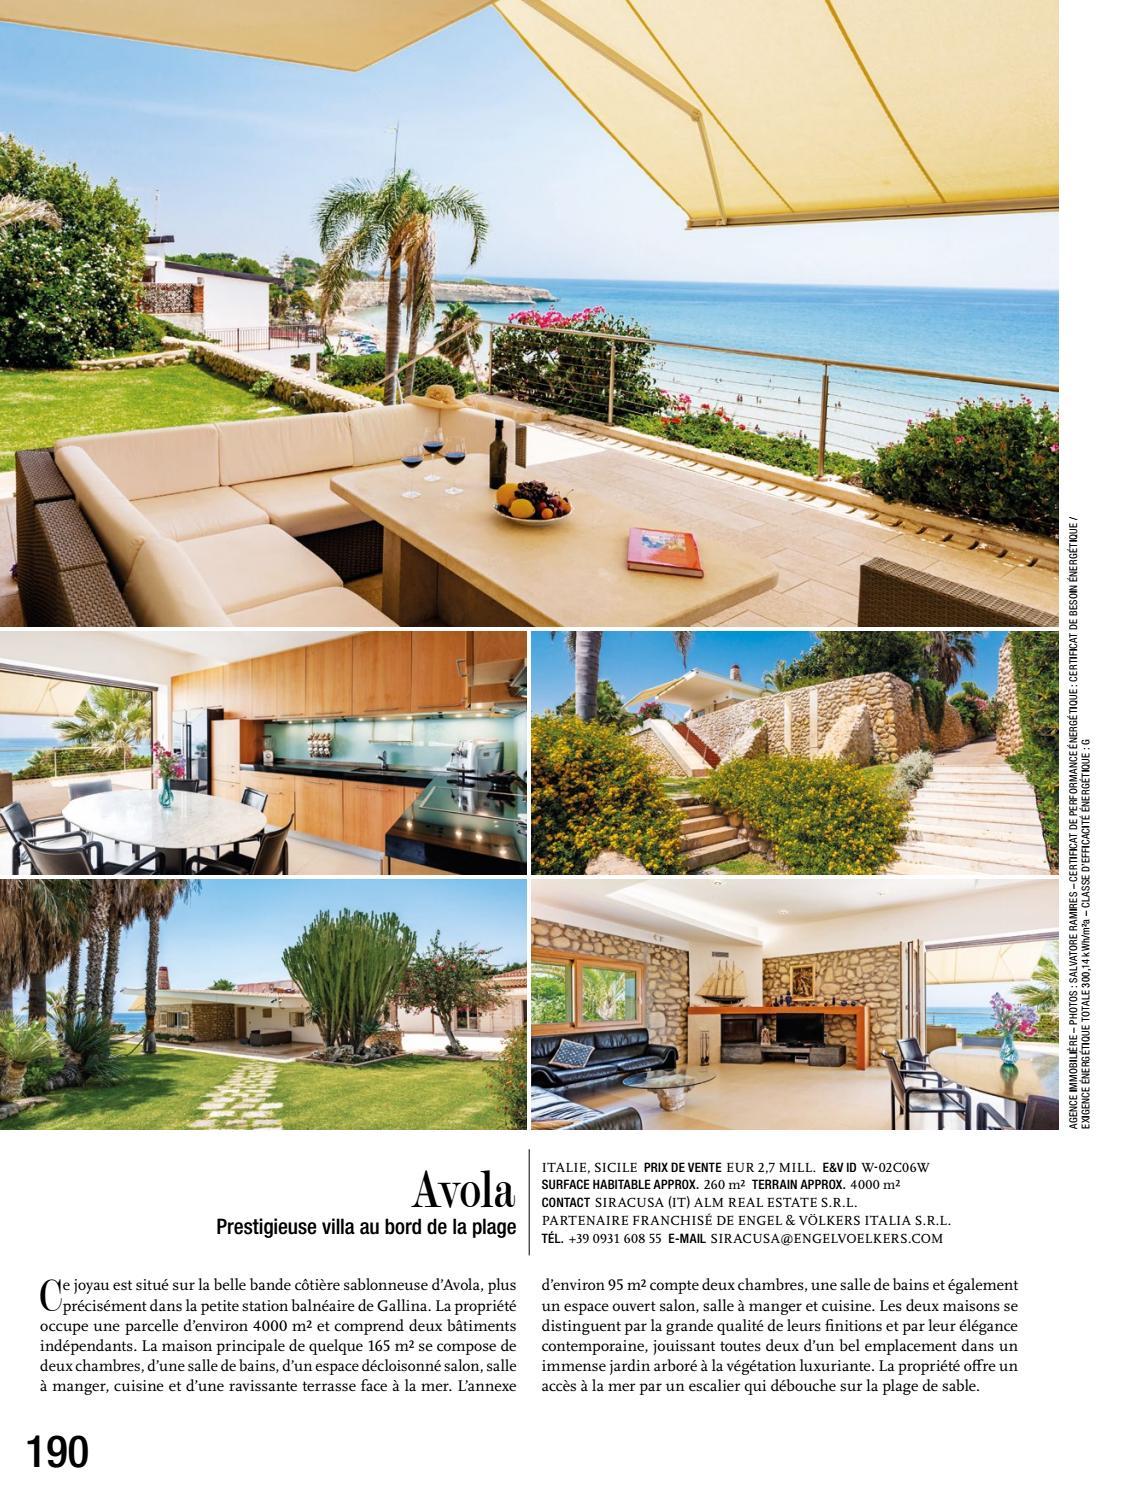 Emplacement Cuisine Dans La Maison gg magazine 01/19 (french)gg-magazine - issuu